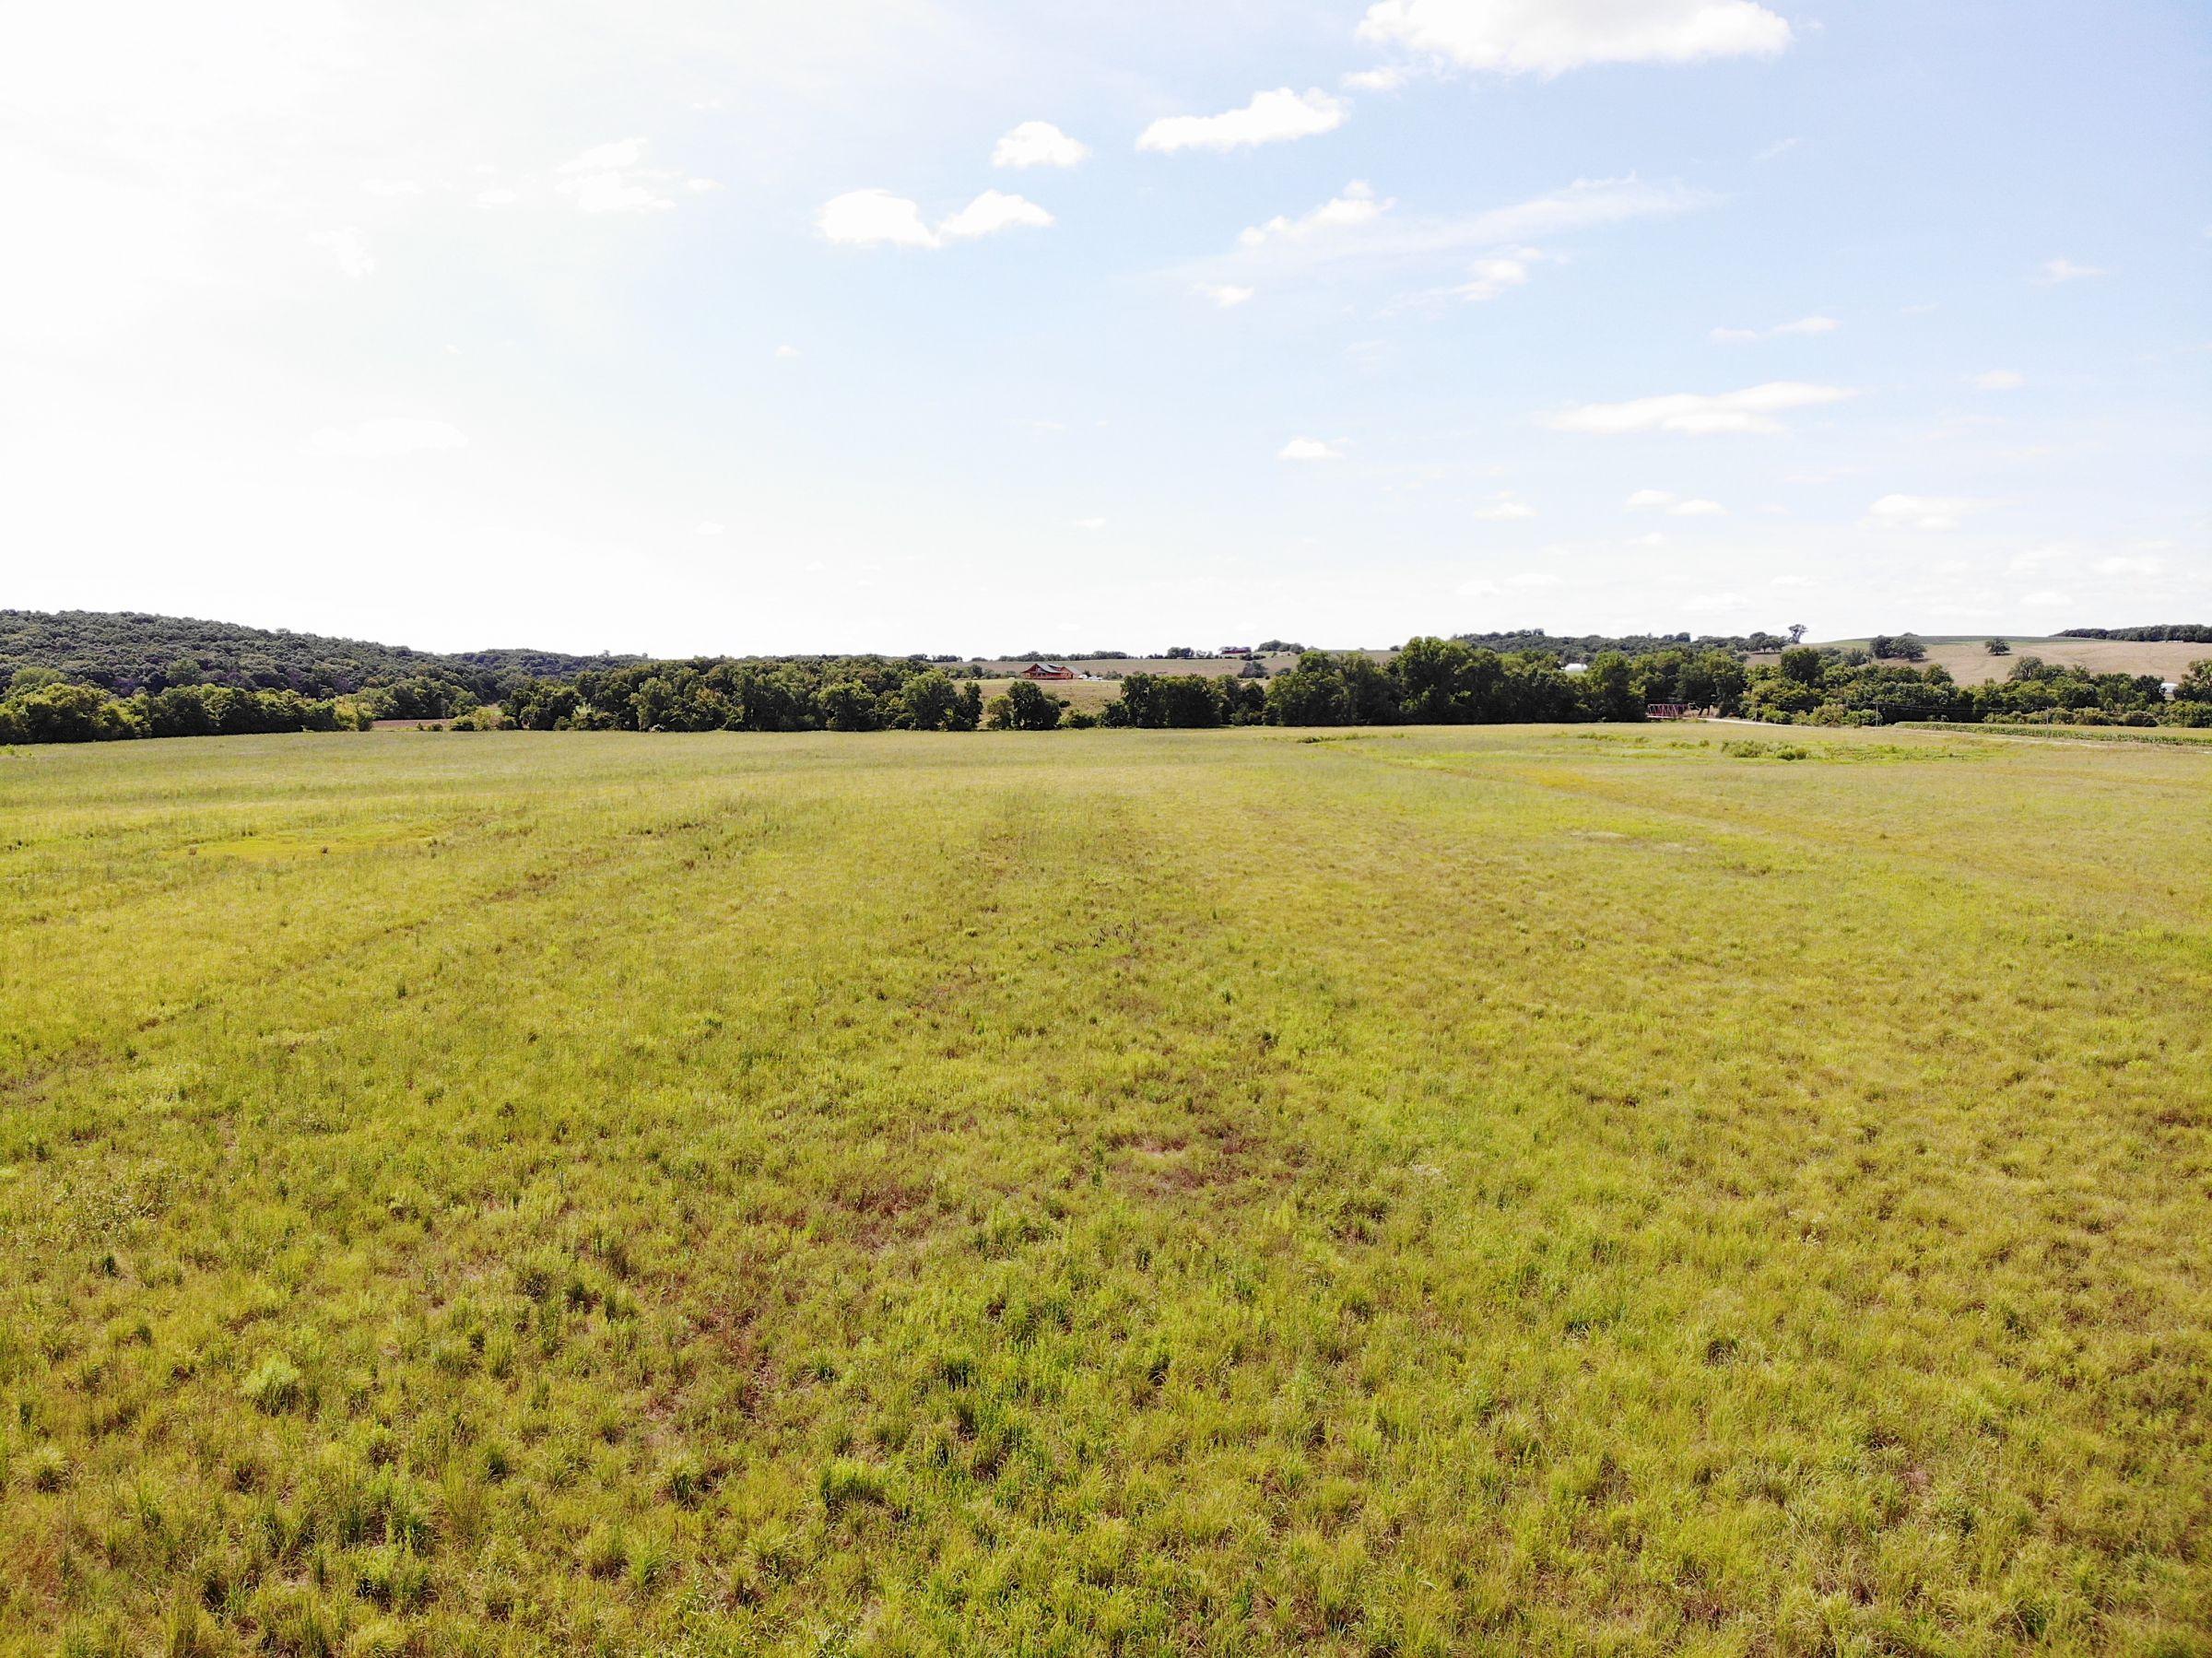 land-warren-county-iowa-84-acres-listing-number-15103-3-2020-08-05-144420.jpg